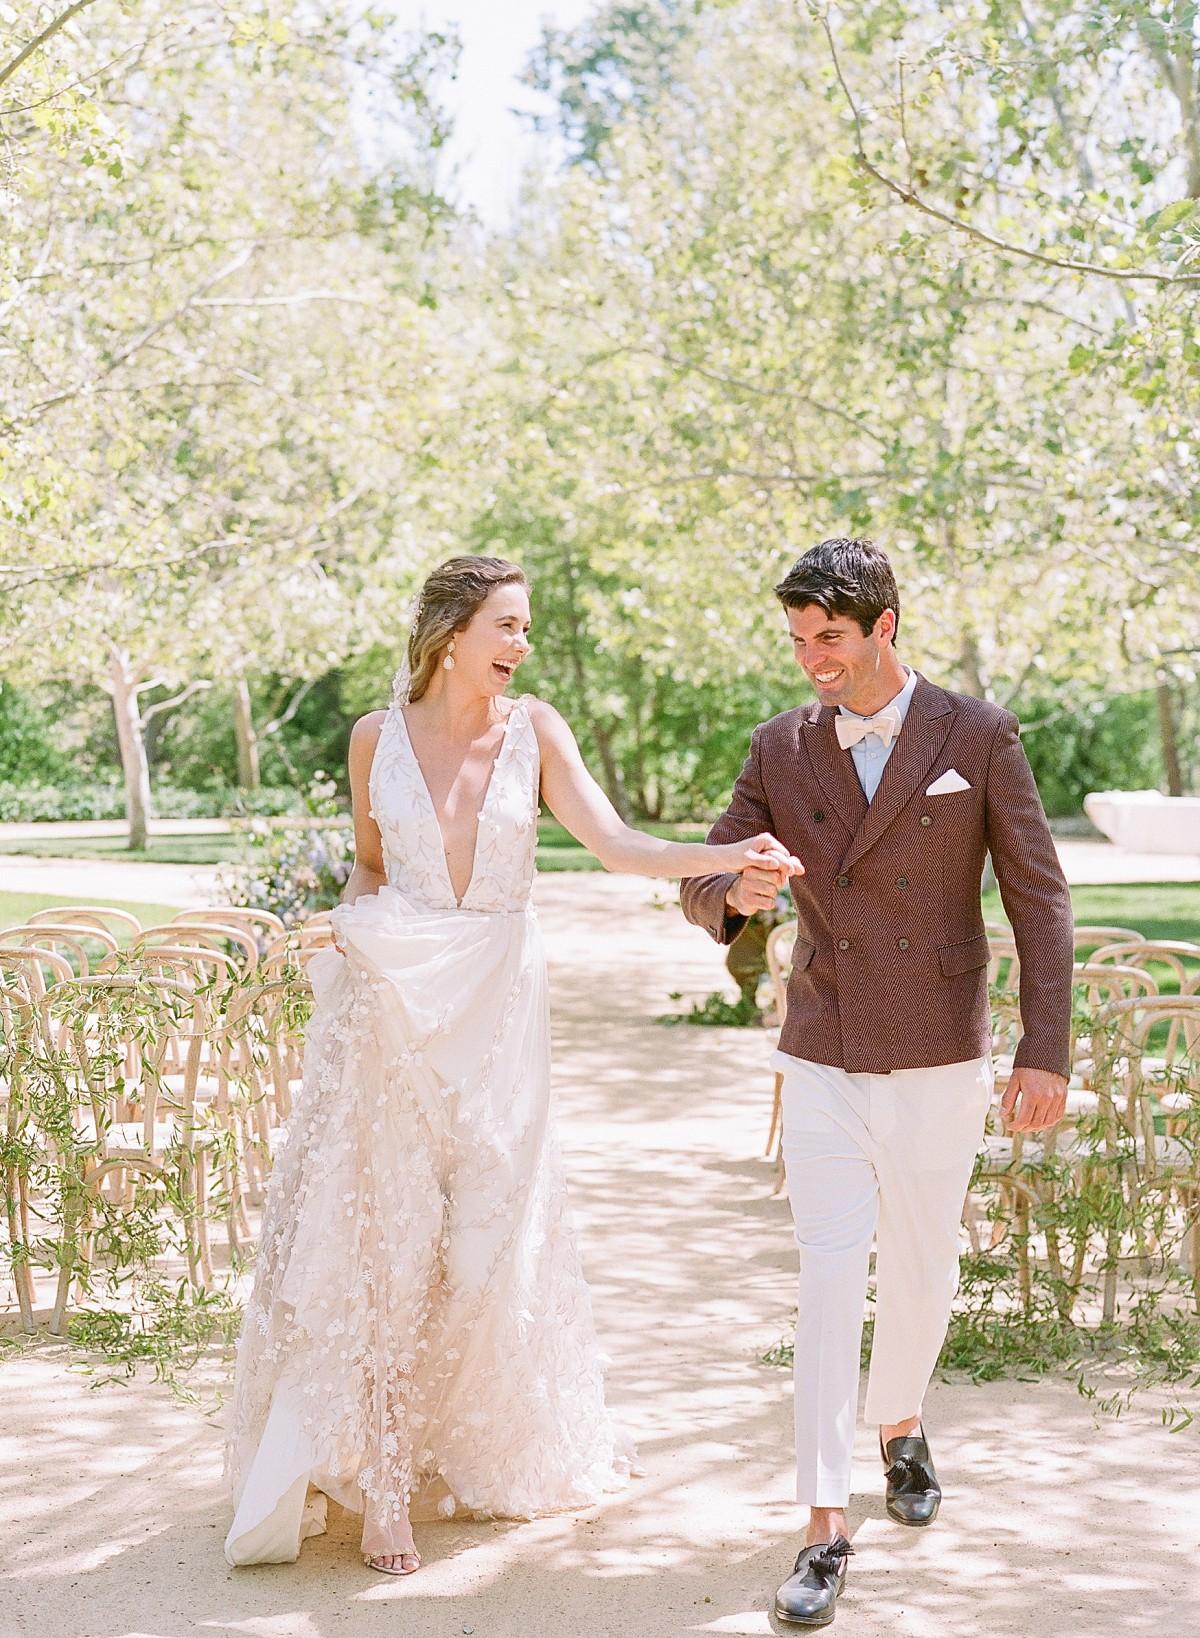 French style wedding ideas